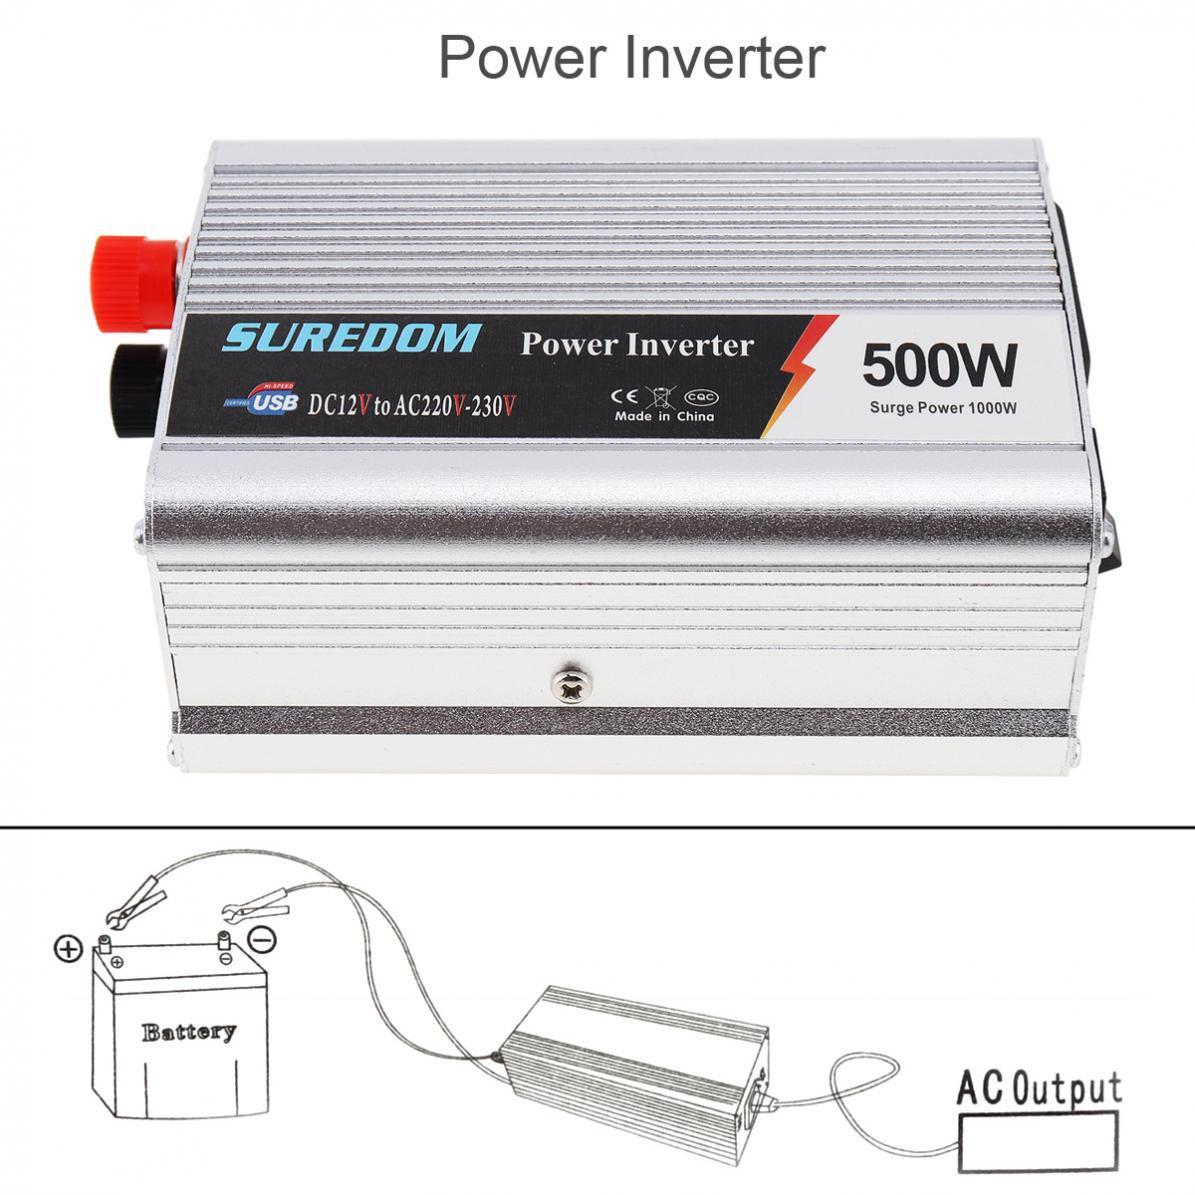 Freeshipping 500W DC 12V 24V to AC 220V 110V Vehicle Power Inverter USB Adapter Portable Voltage Transformer Car Charger Surge Power 1000W